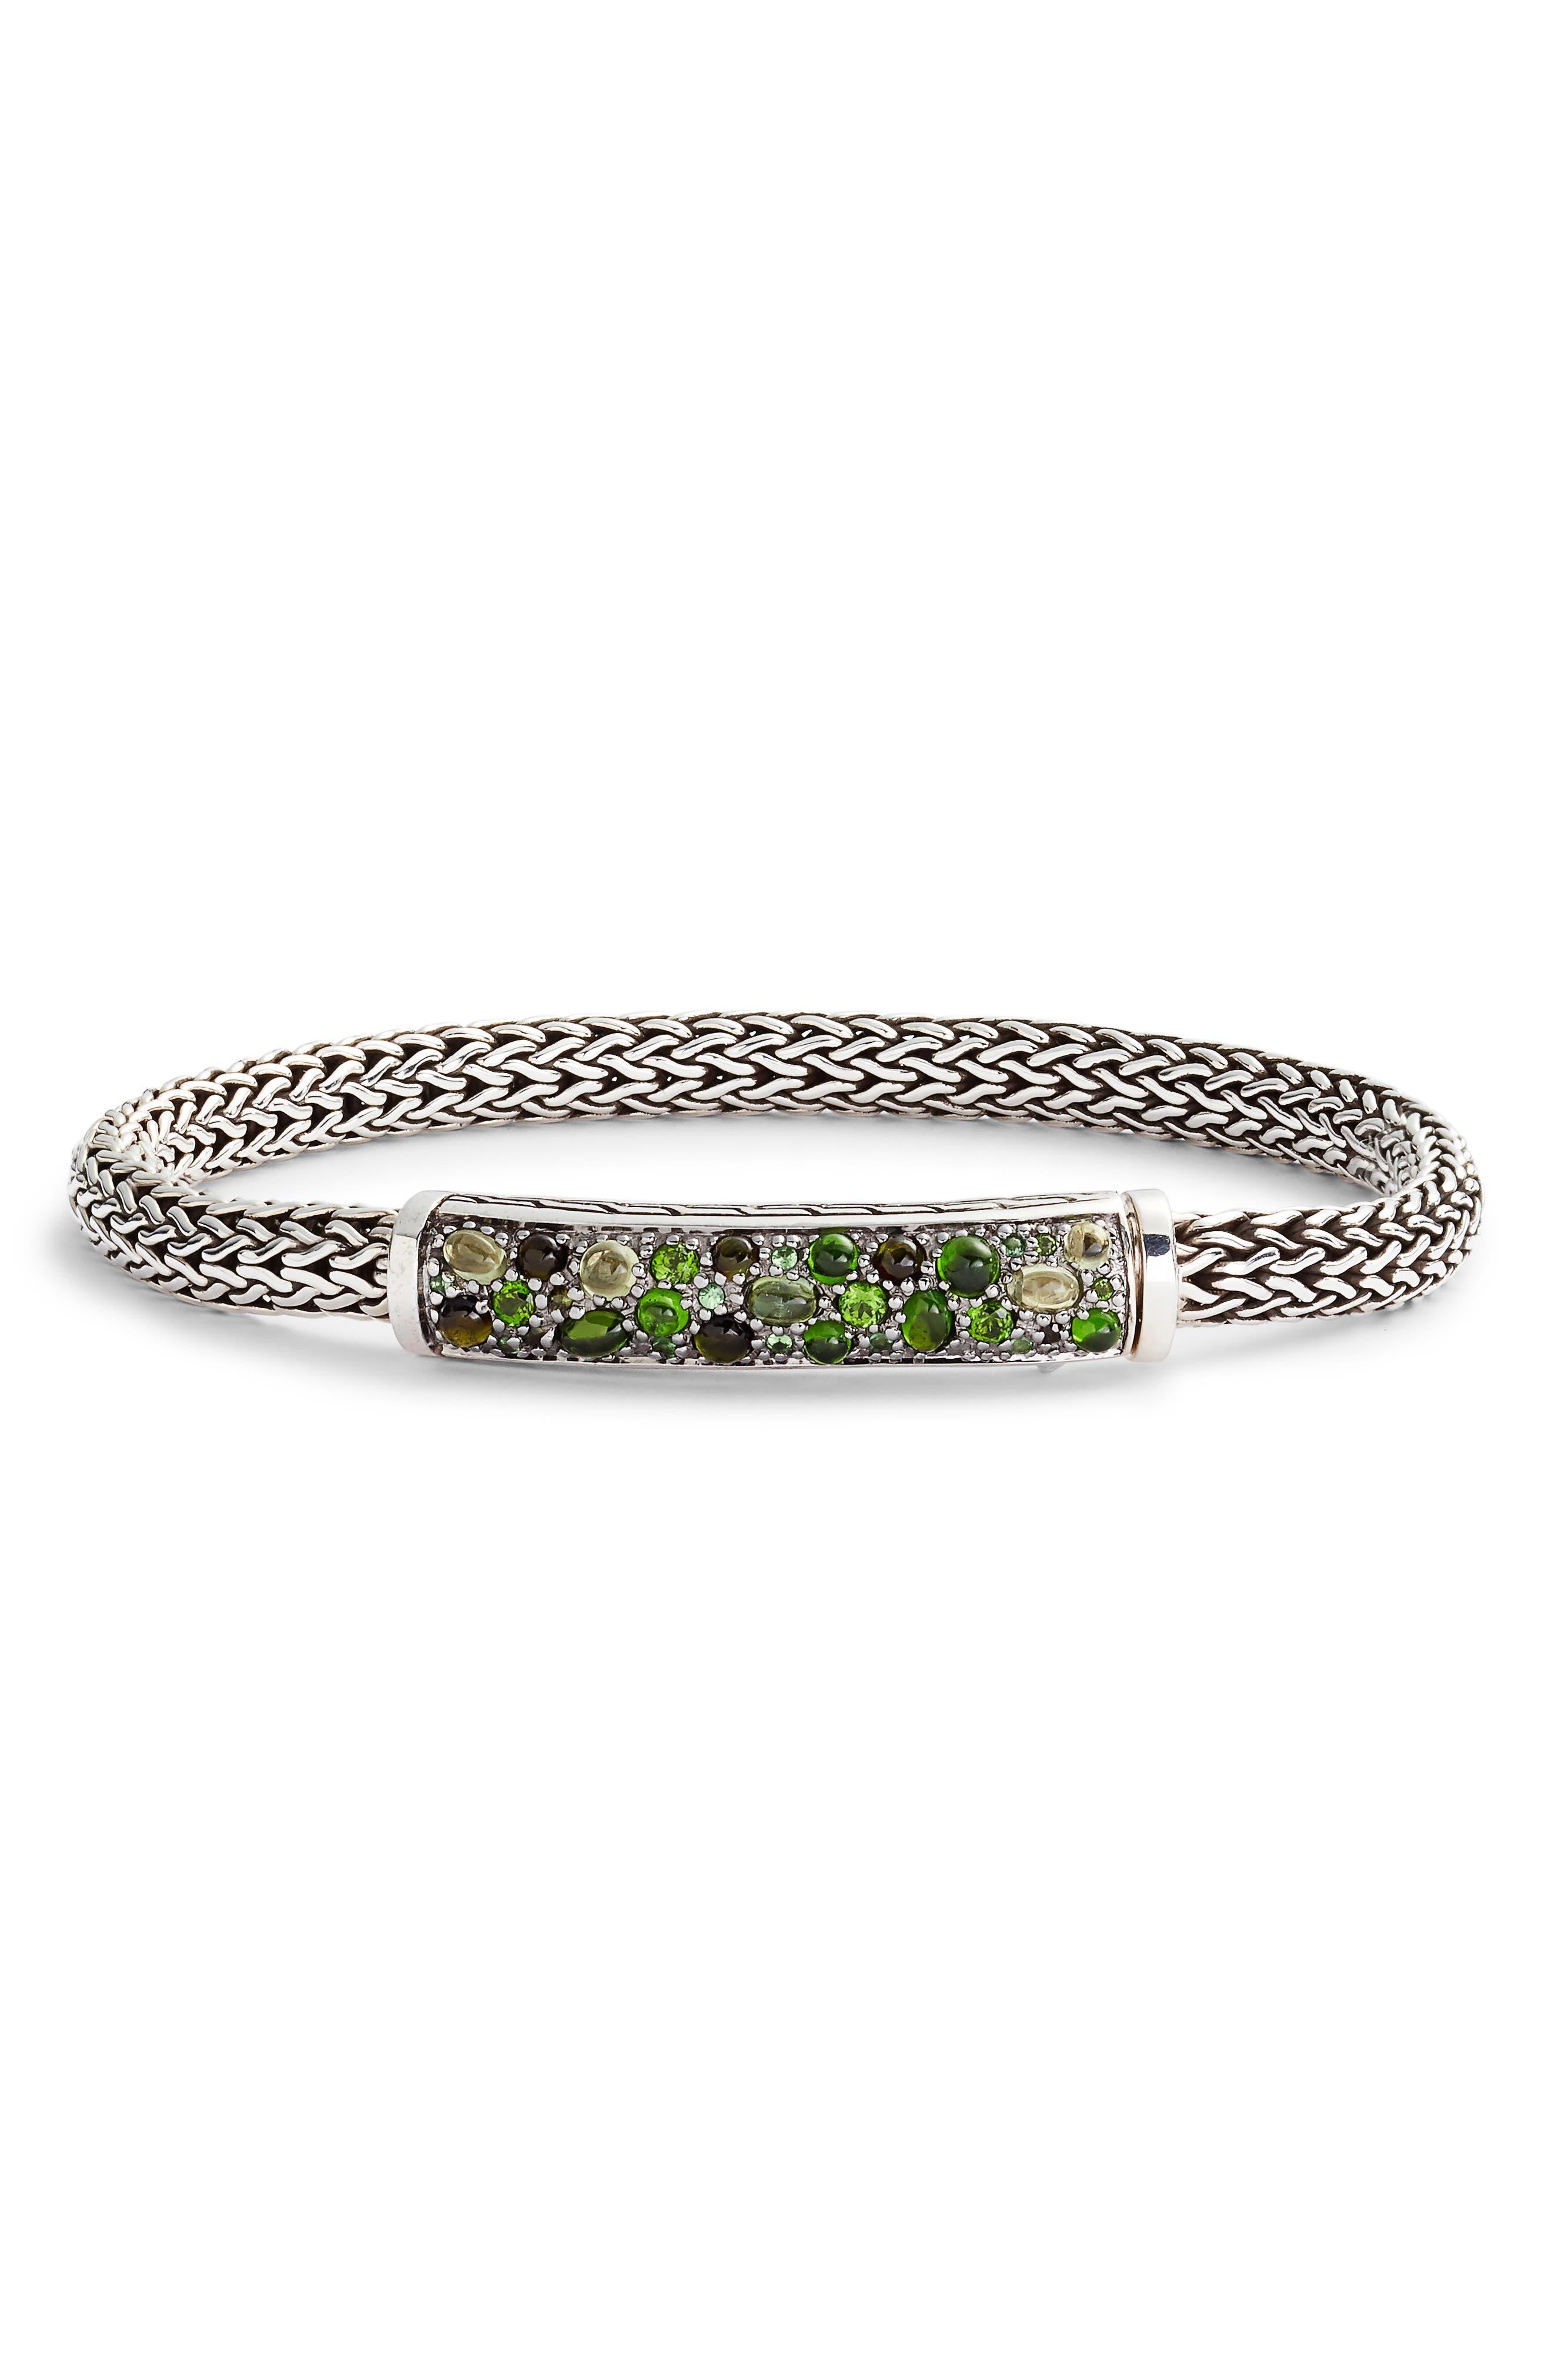 Sterling Silver Classic Chain Extra Small Bracelet With Green Tourmaline, Chrome Diopside & Peridot in Tourmaline/ Peridot/ Tsavorite